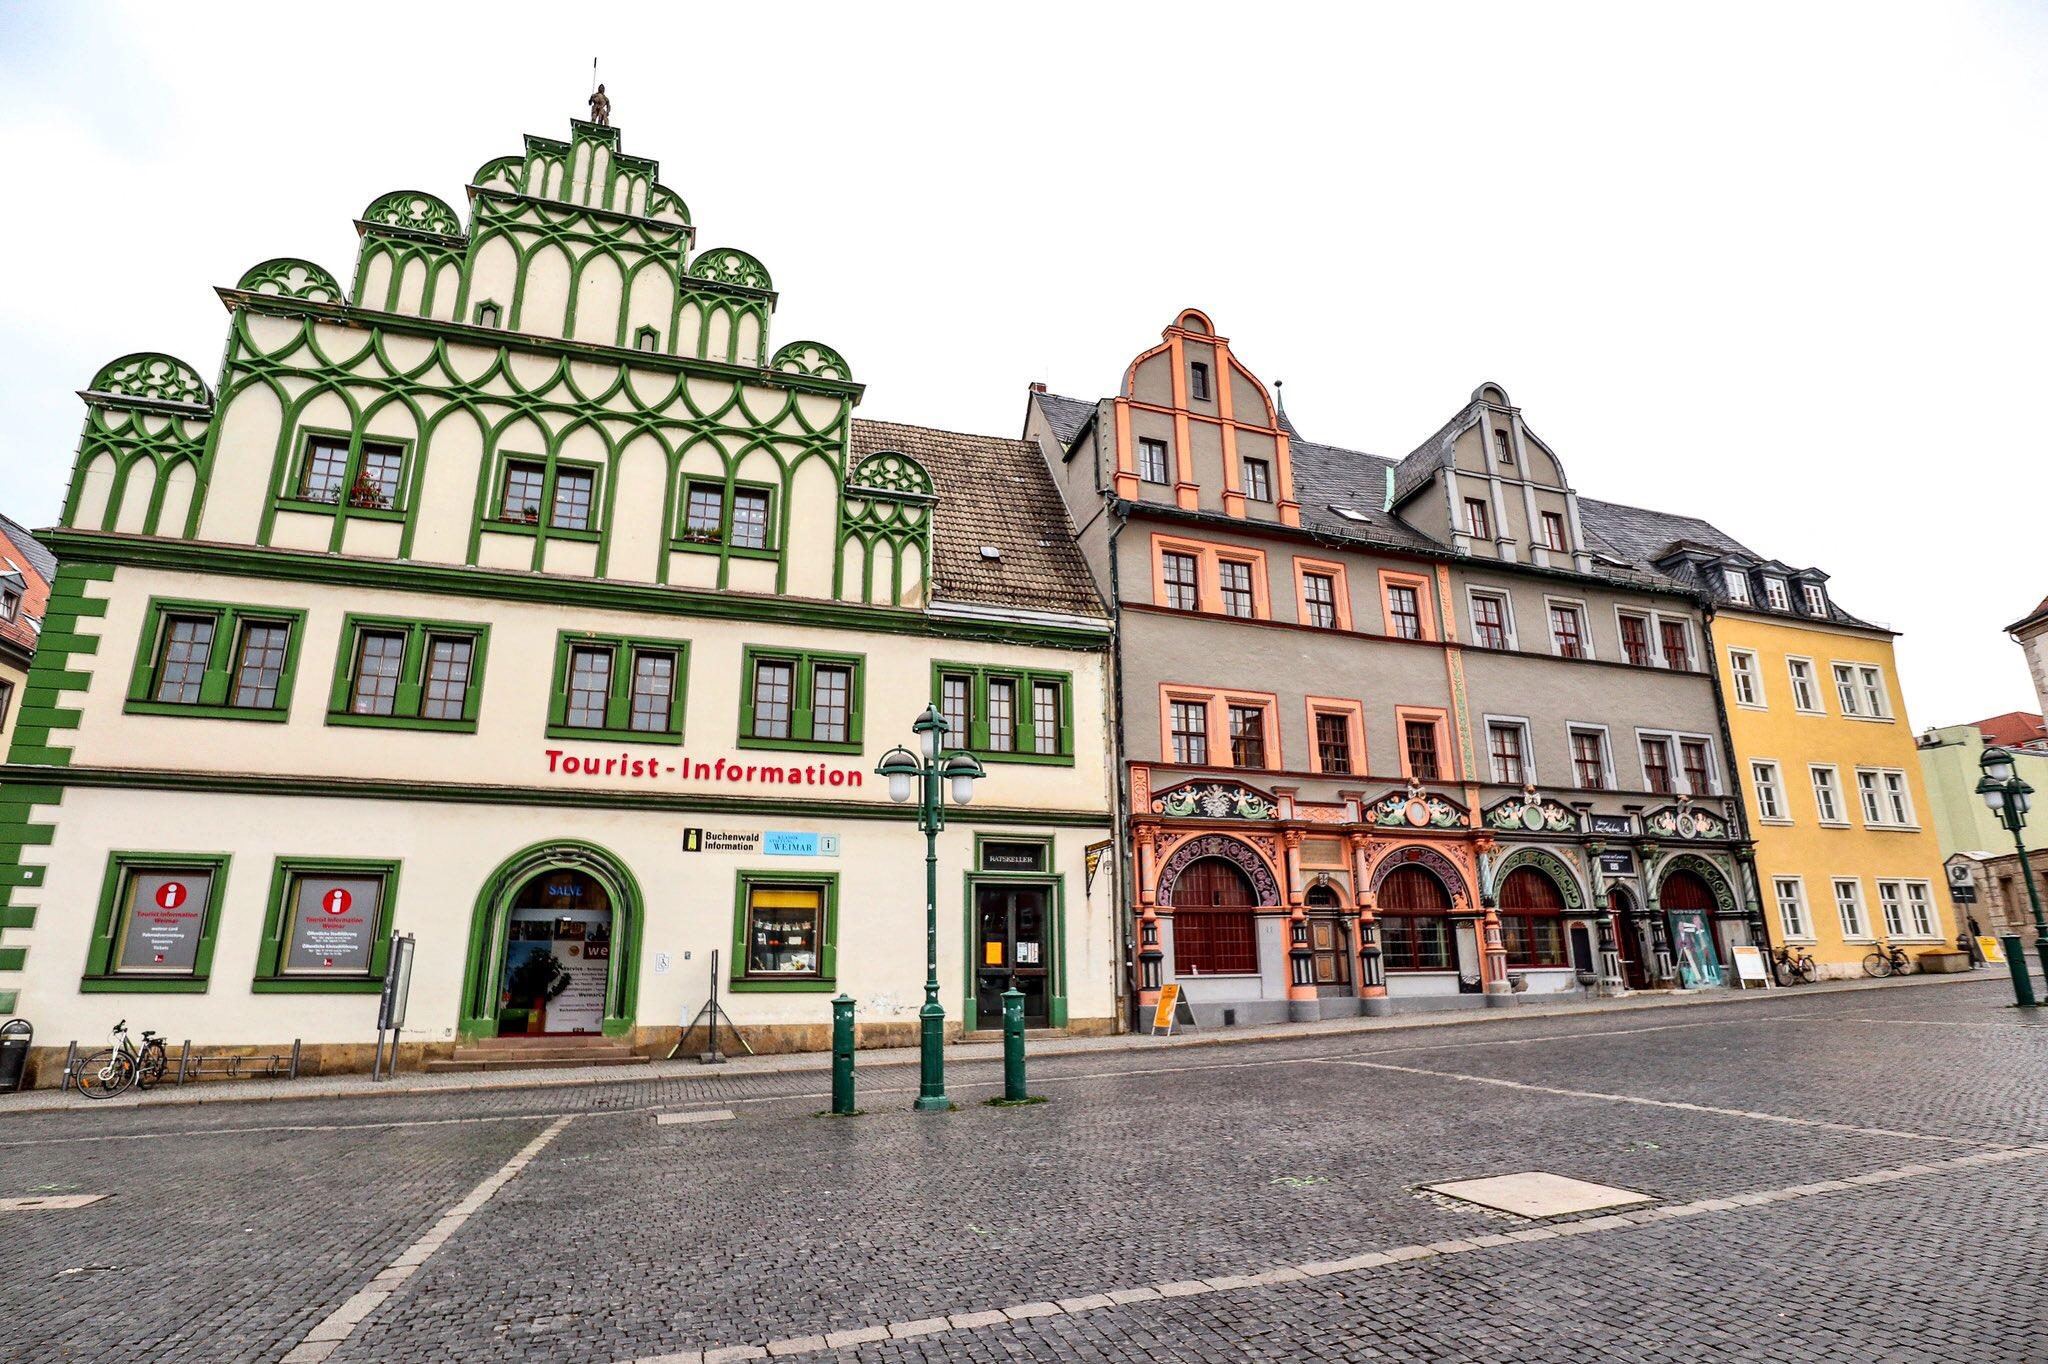 Weimar Tourist Information Centre, Germany